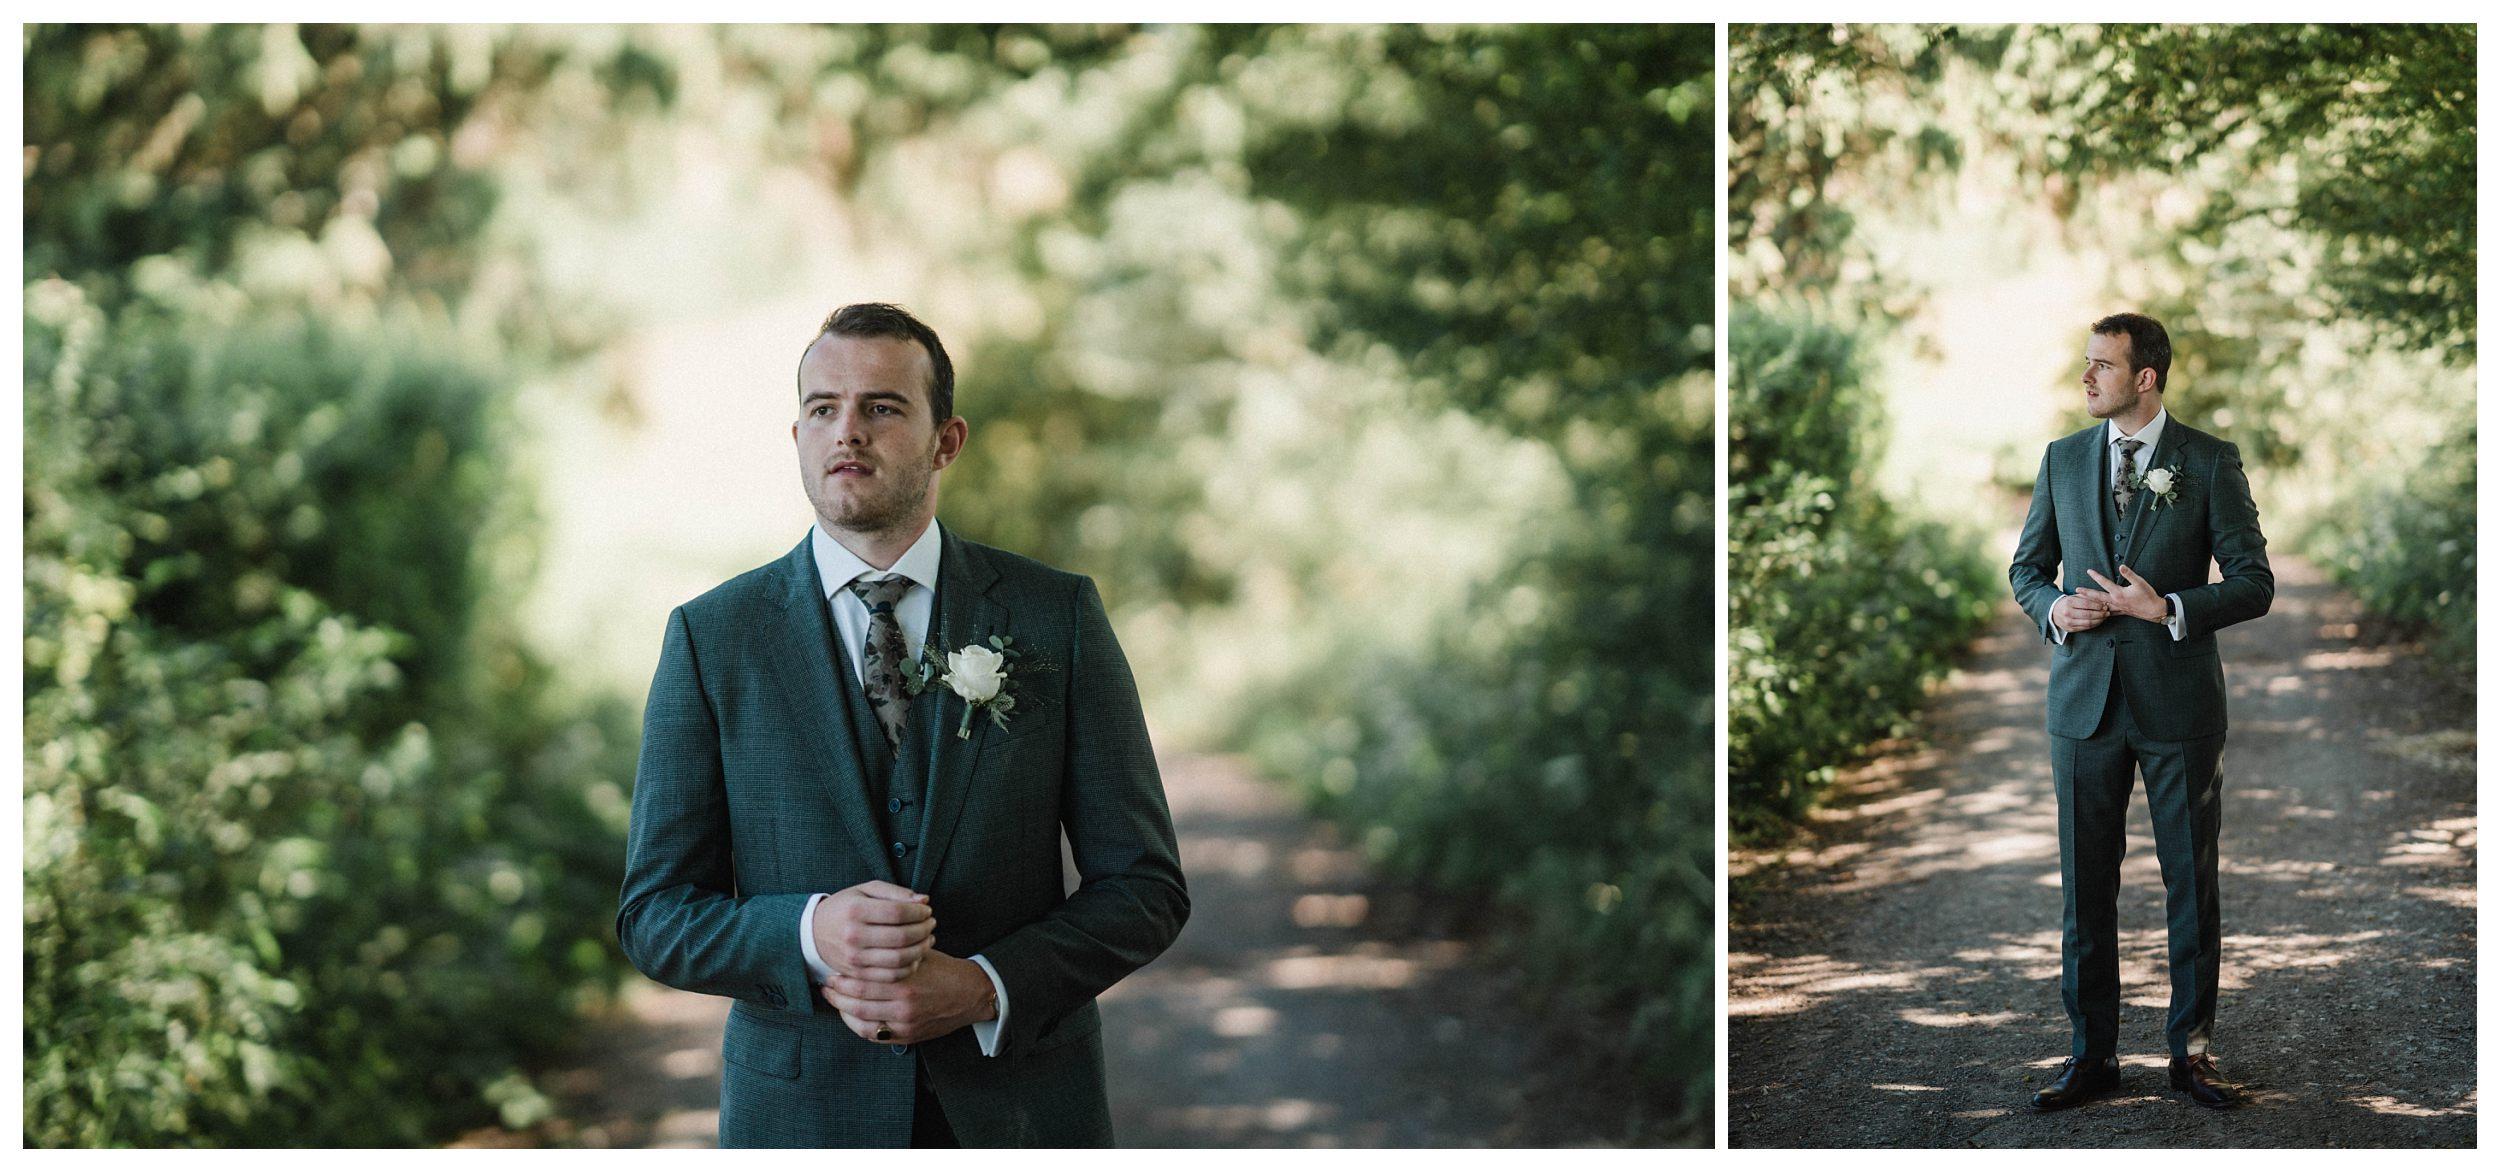 huwelijksfotograaf bruidsfotograaf destinationwedding huwelijksfotografie in ardennen nederland (39).jpg